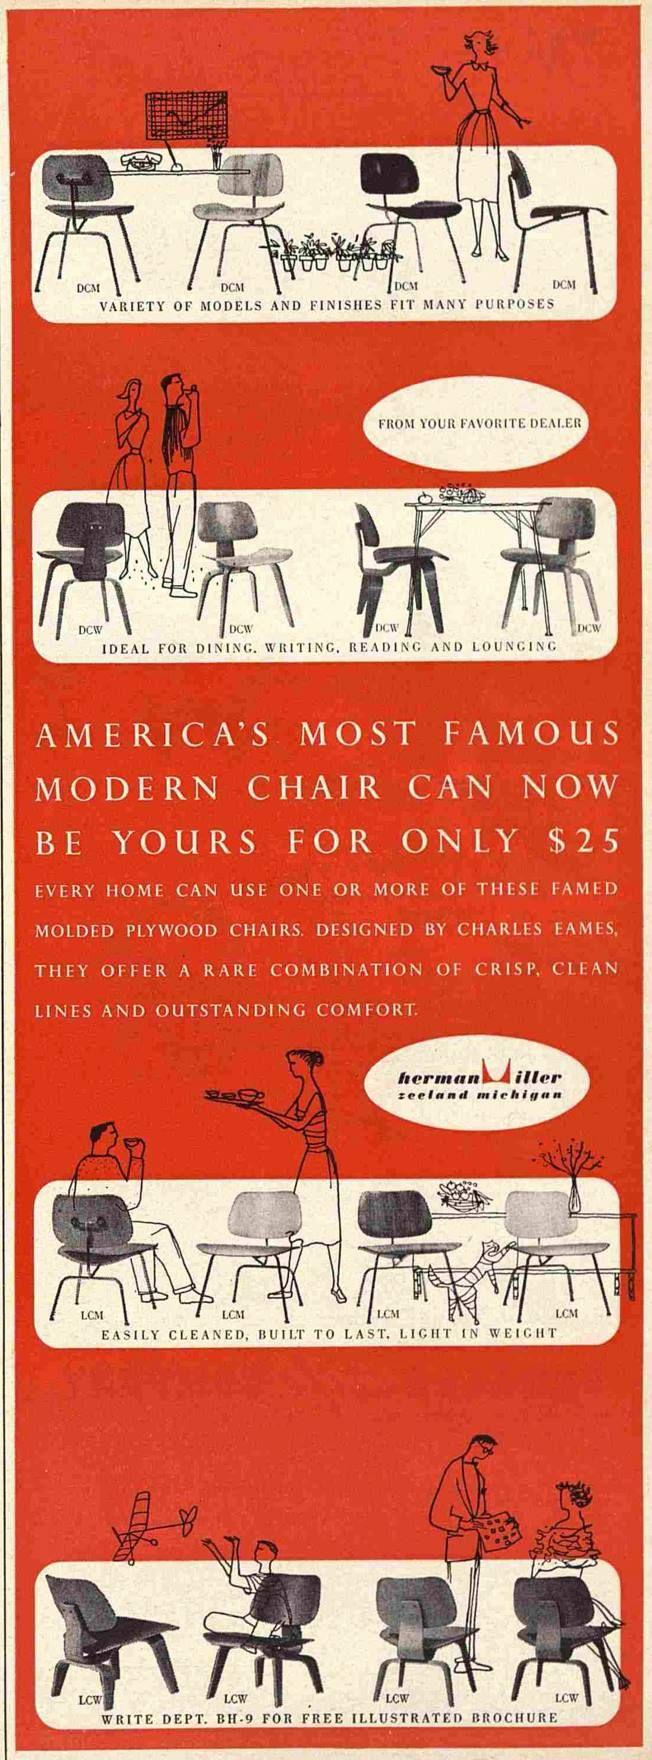 Remarkable Eames Americas Most Famous Modern Chair Vintage Frankydiablos Diy Chair Ideas Frankydiabloscom